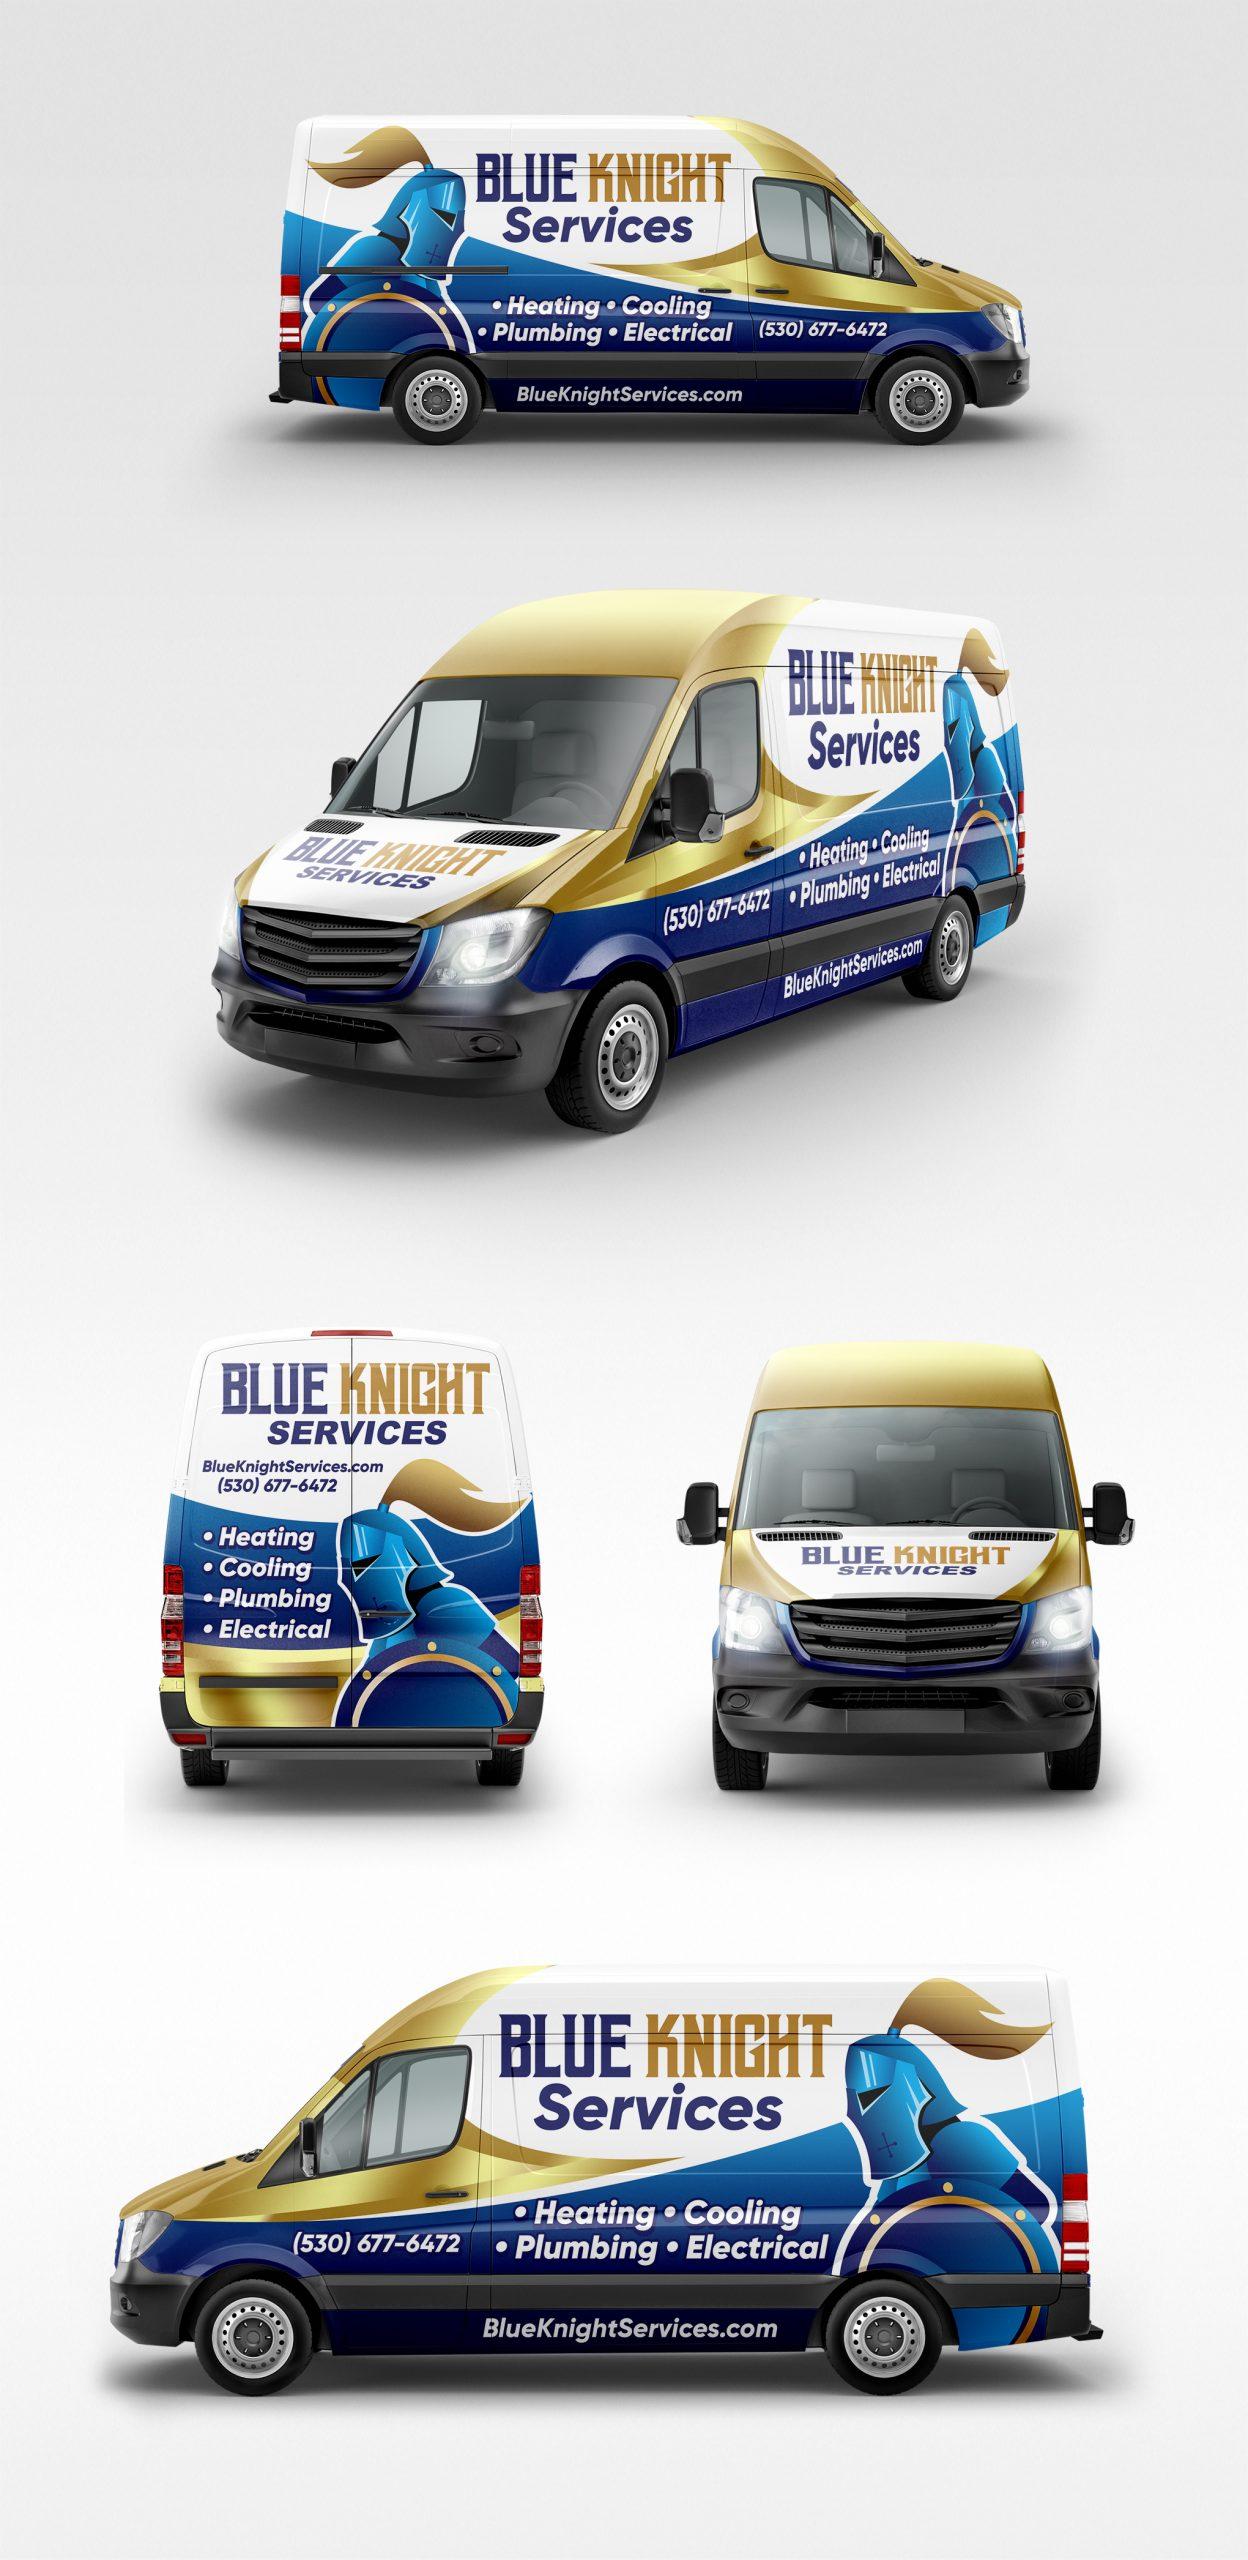 Blue Knight van wrap